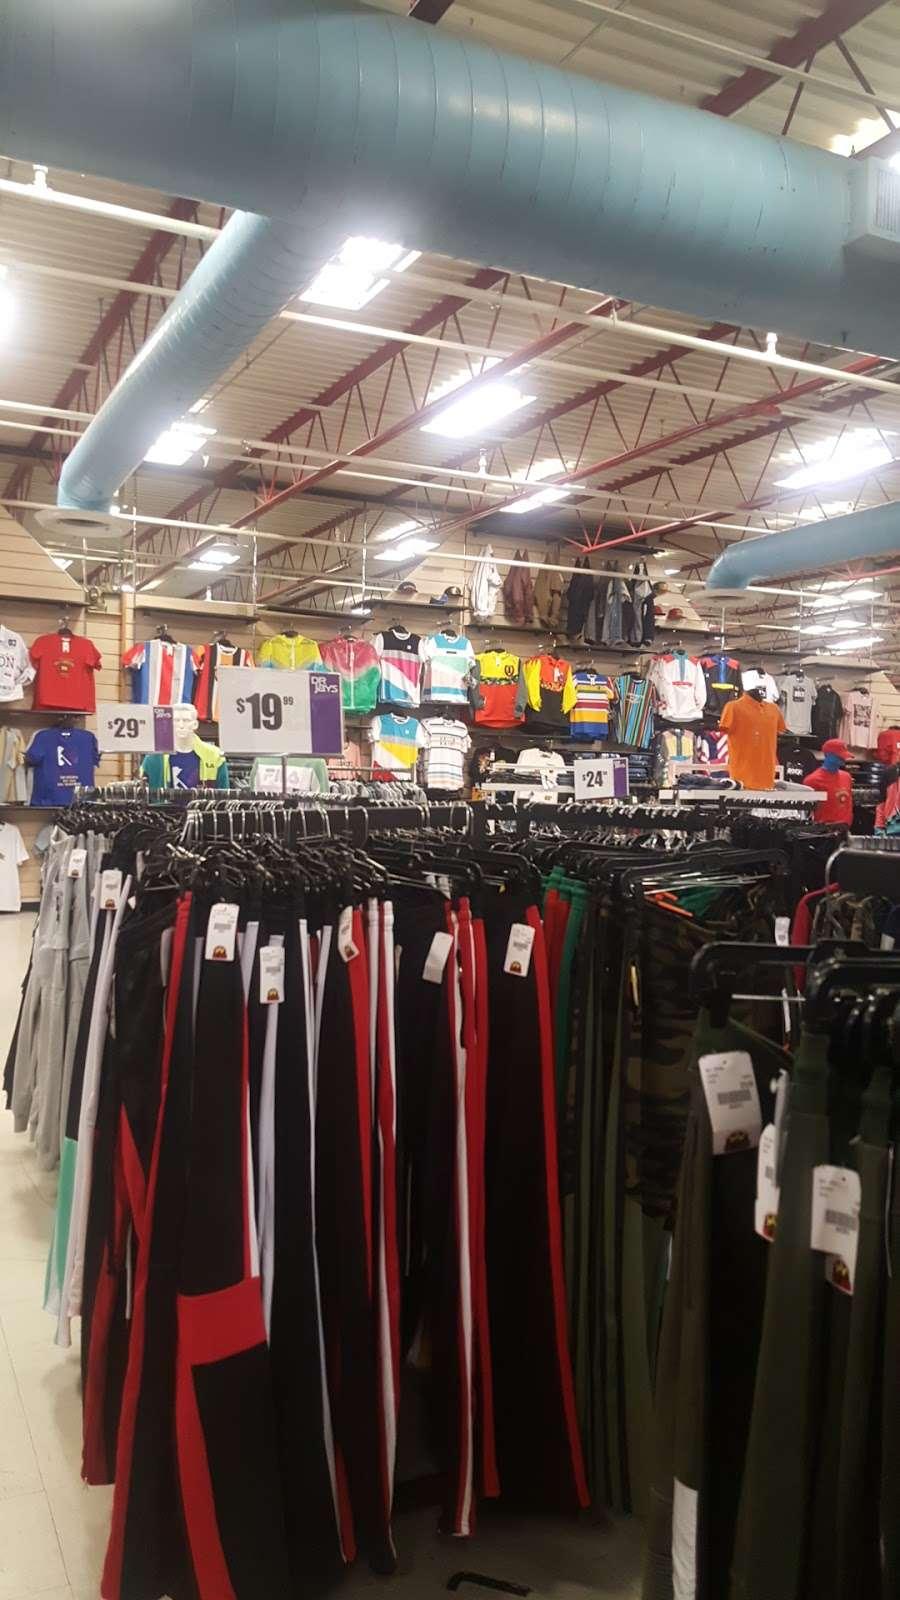 Dr Jays - clothing store  | Photo 4 of 10 | Address: 215 E Fordham Rd, The Bronx, NY 10458, USA | Phone: (718) 220-3354